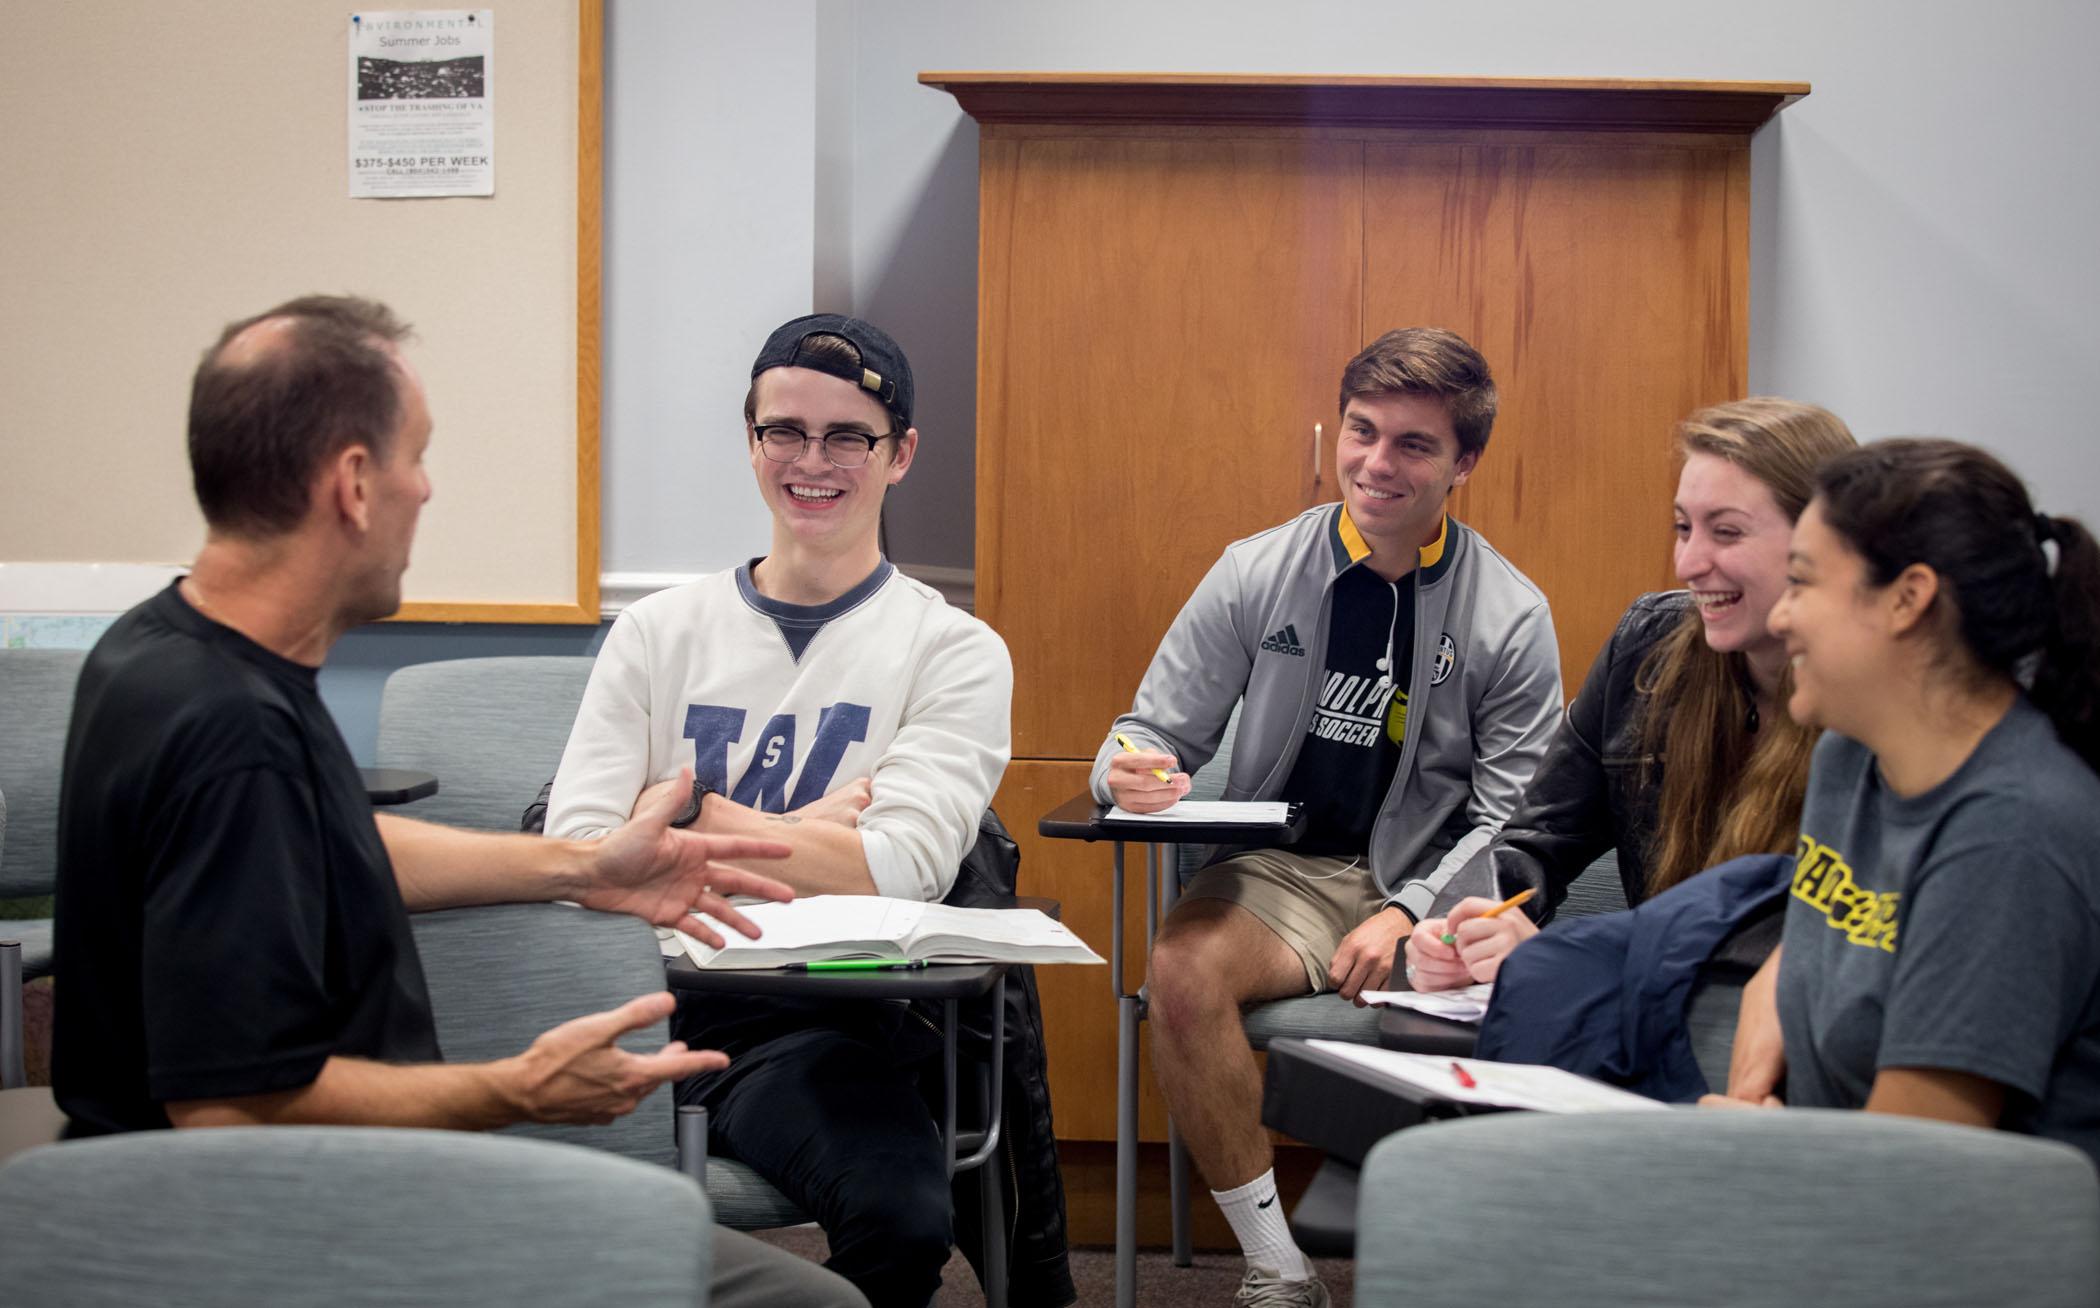 Economics professor Jeff Heinfeldt leads group discussion.